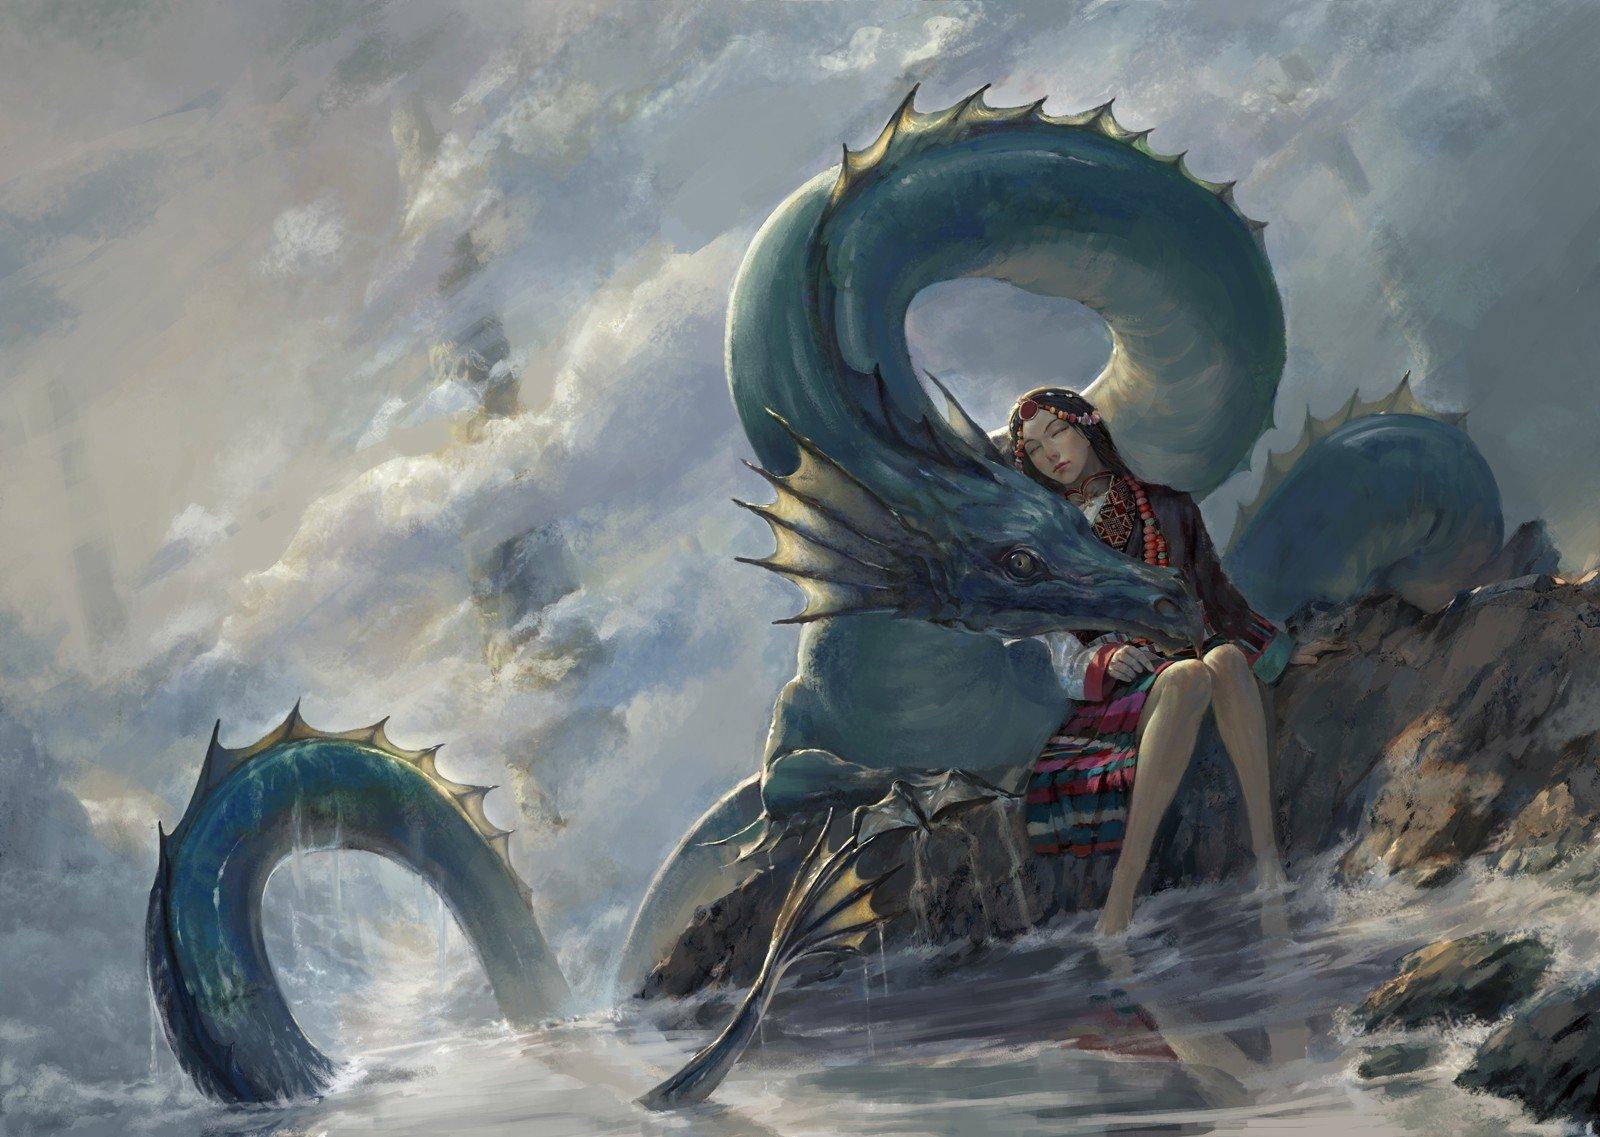 Art Wallpaper Hd For Mobile 23: Water, Fantasy Art, Dragon HD Wallpapers / Desktop And